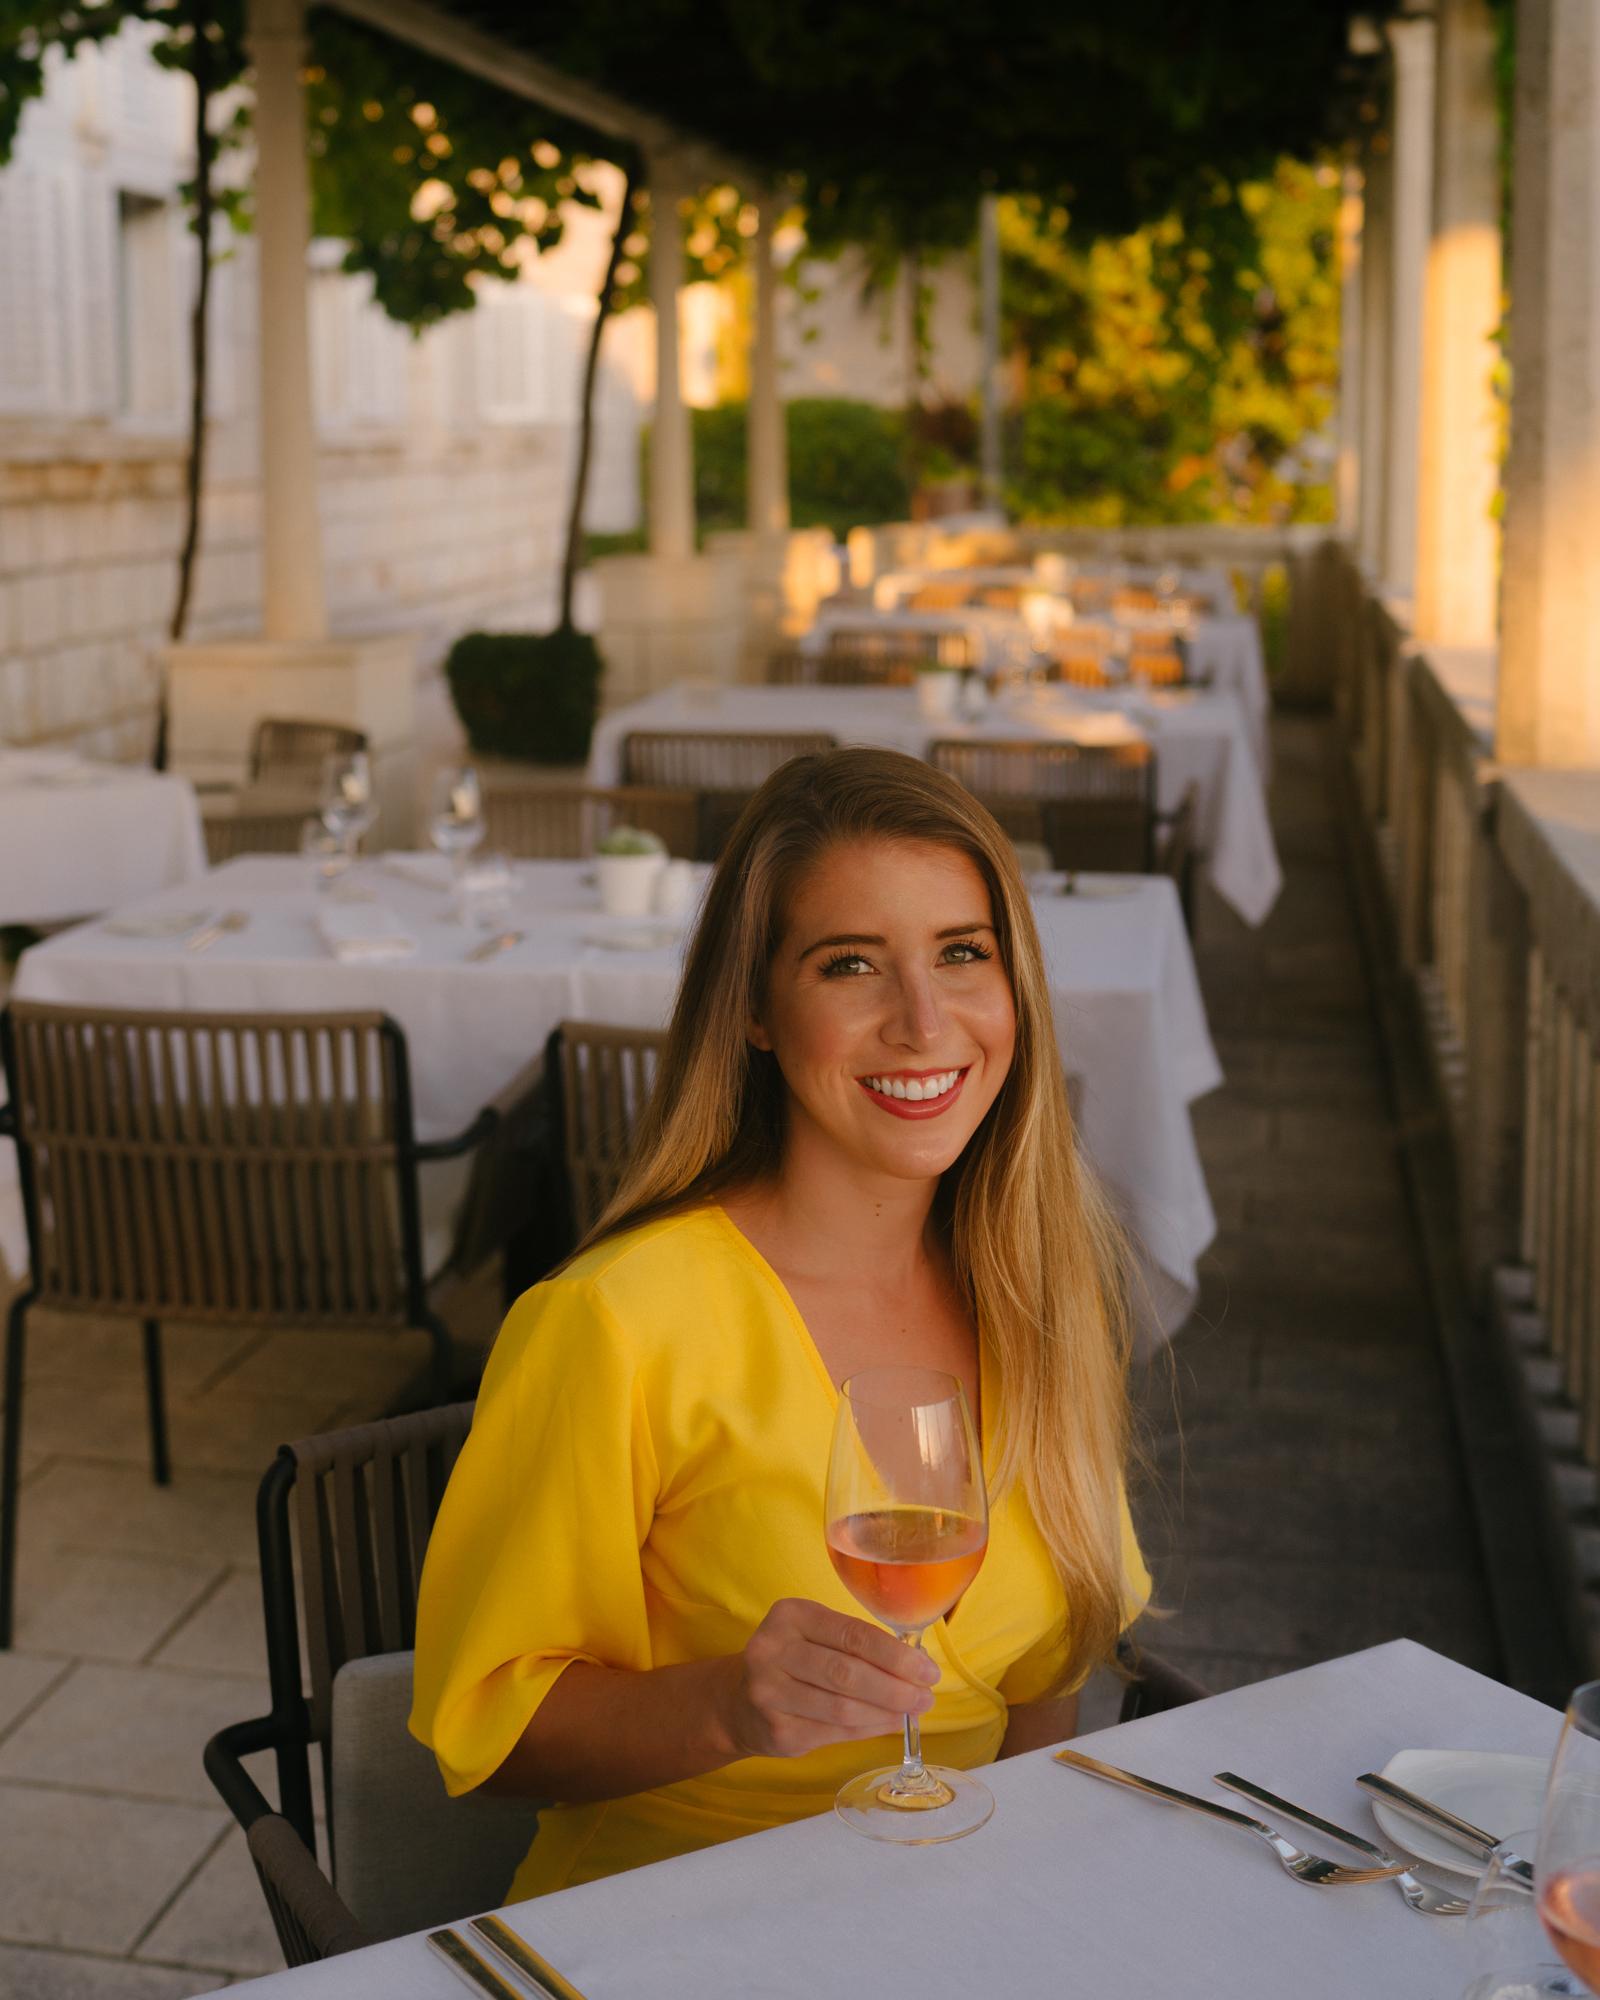 Dinner at Victoria Restaurant in Dubrovnik